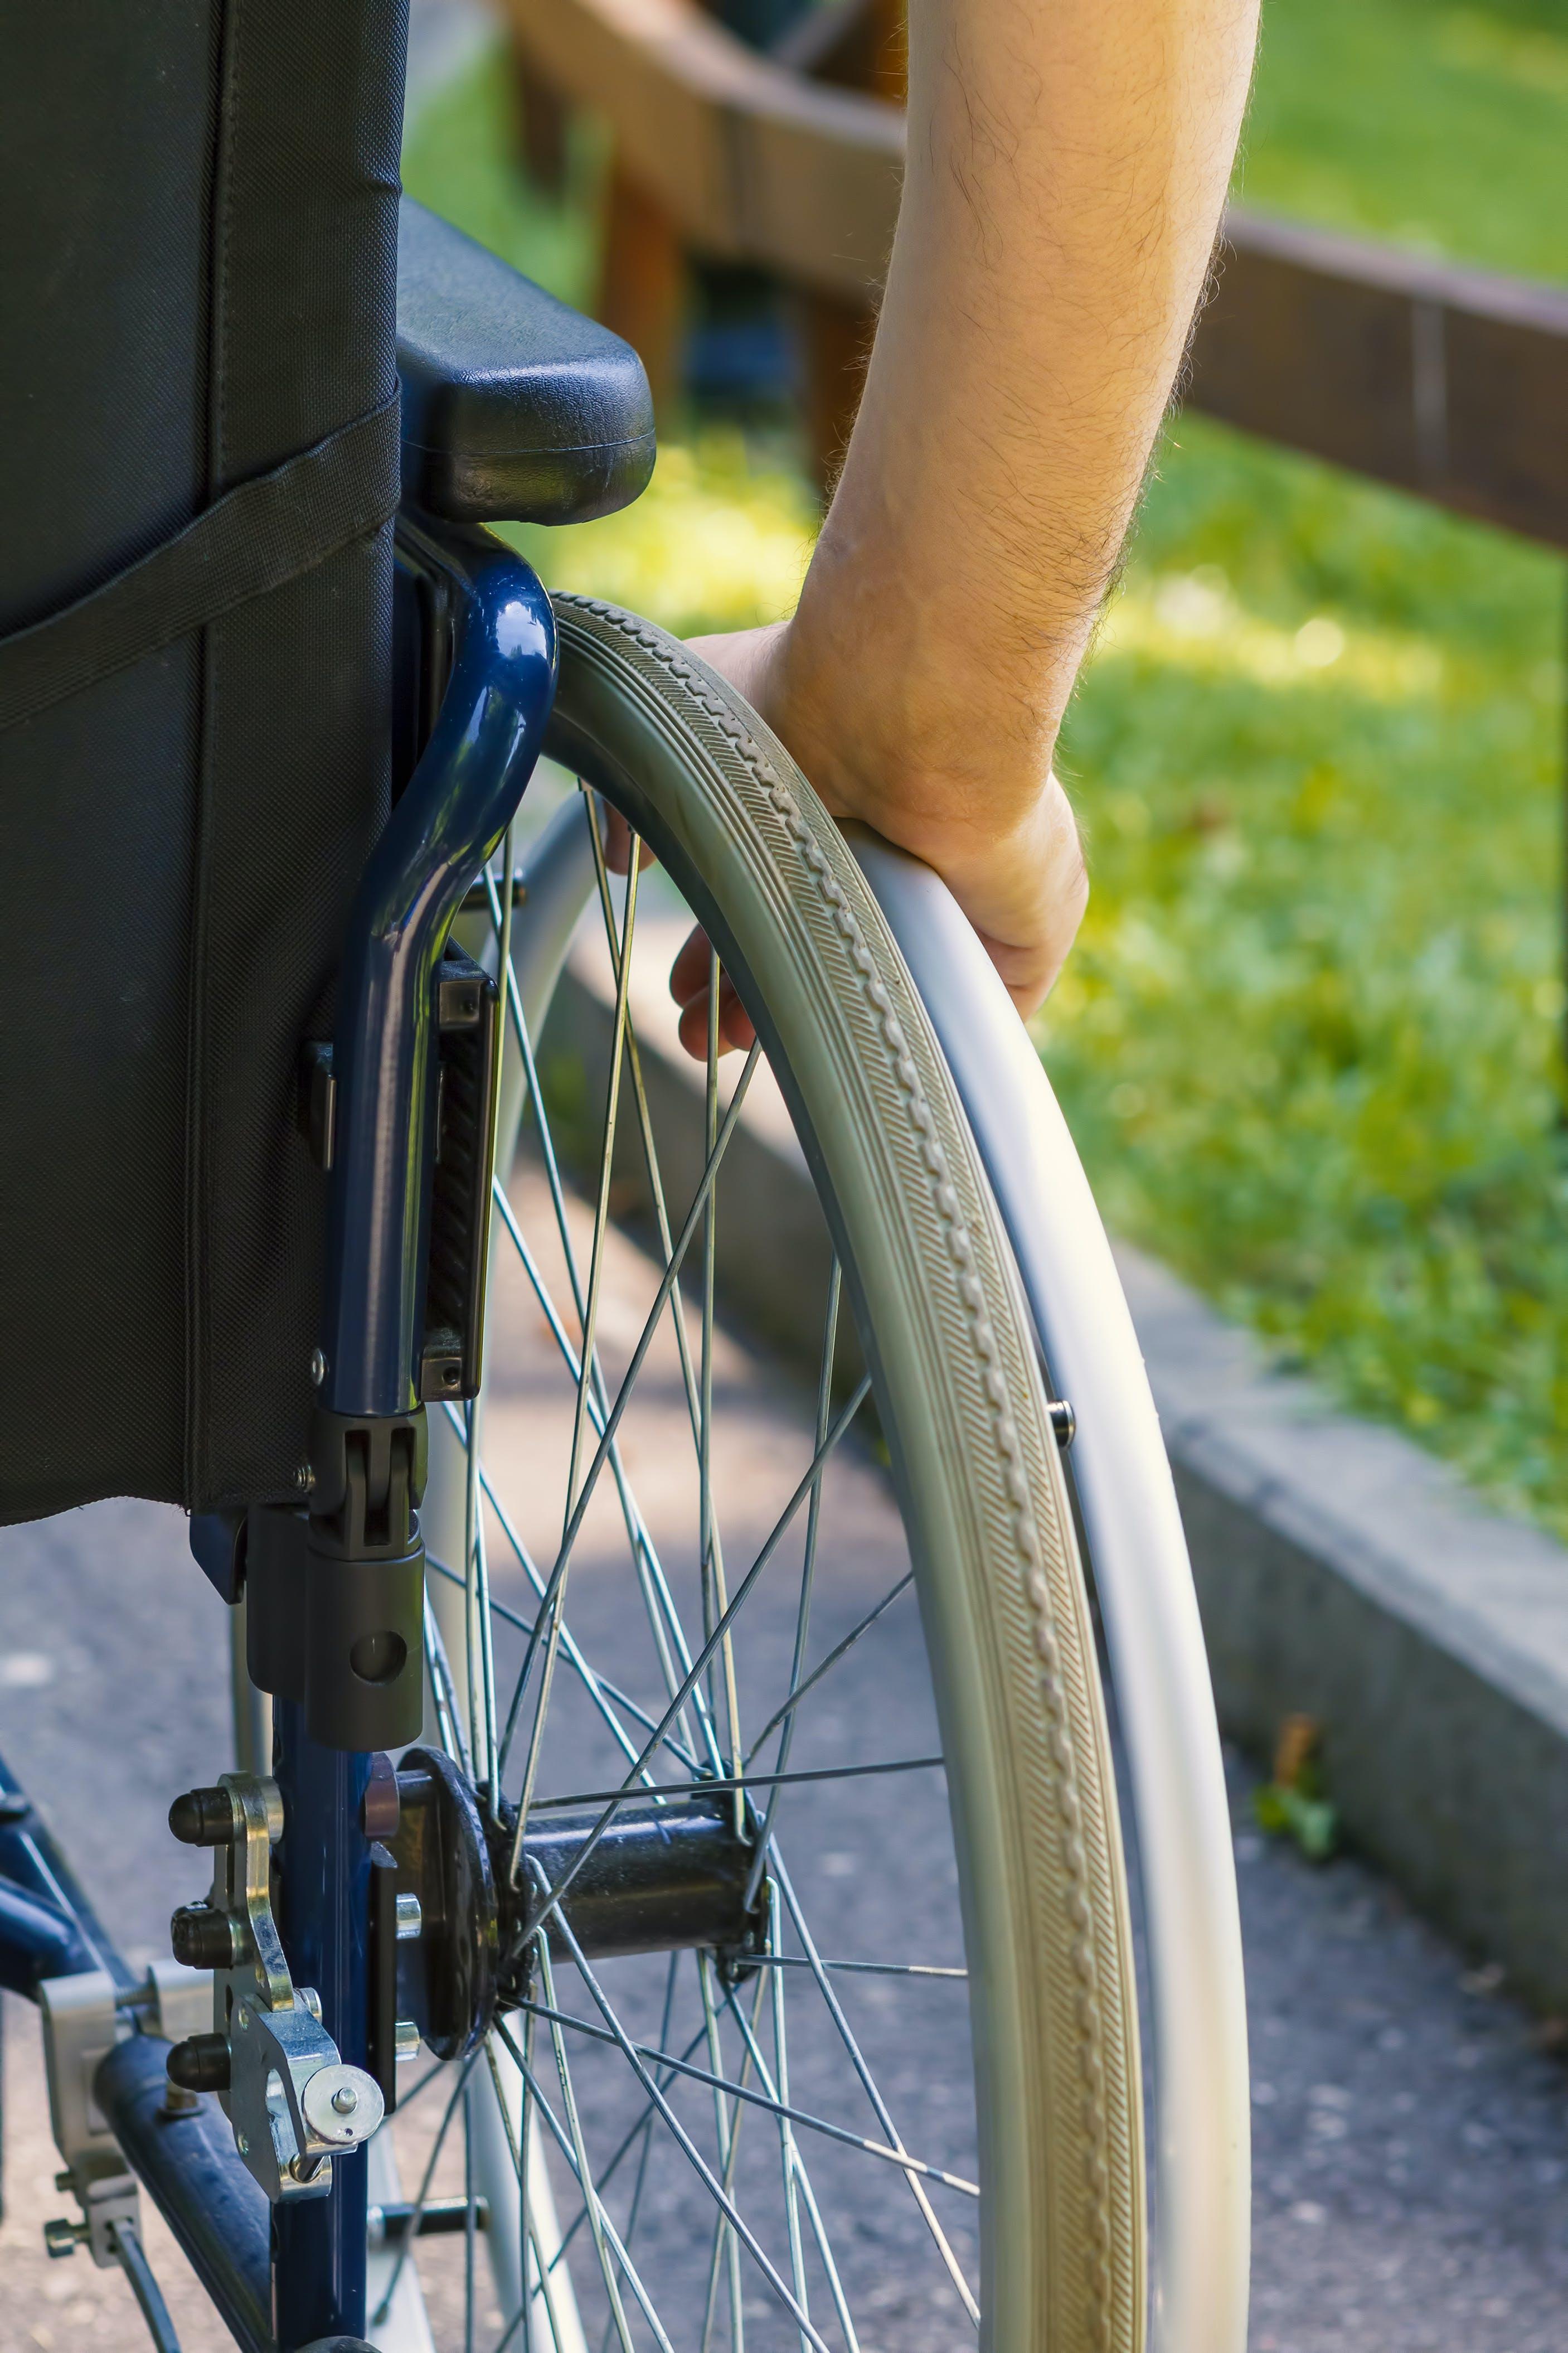 Wheelchair wheel close up